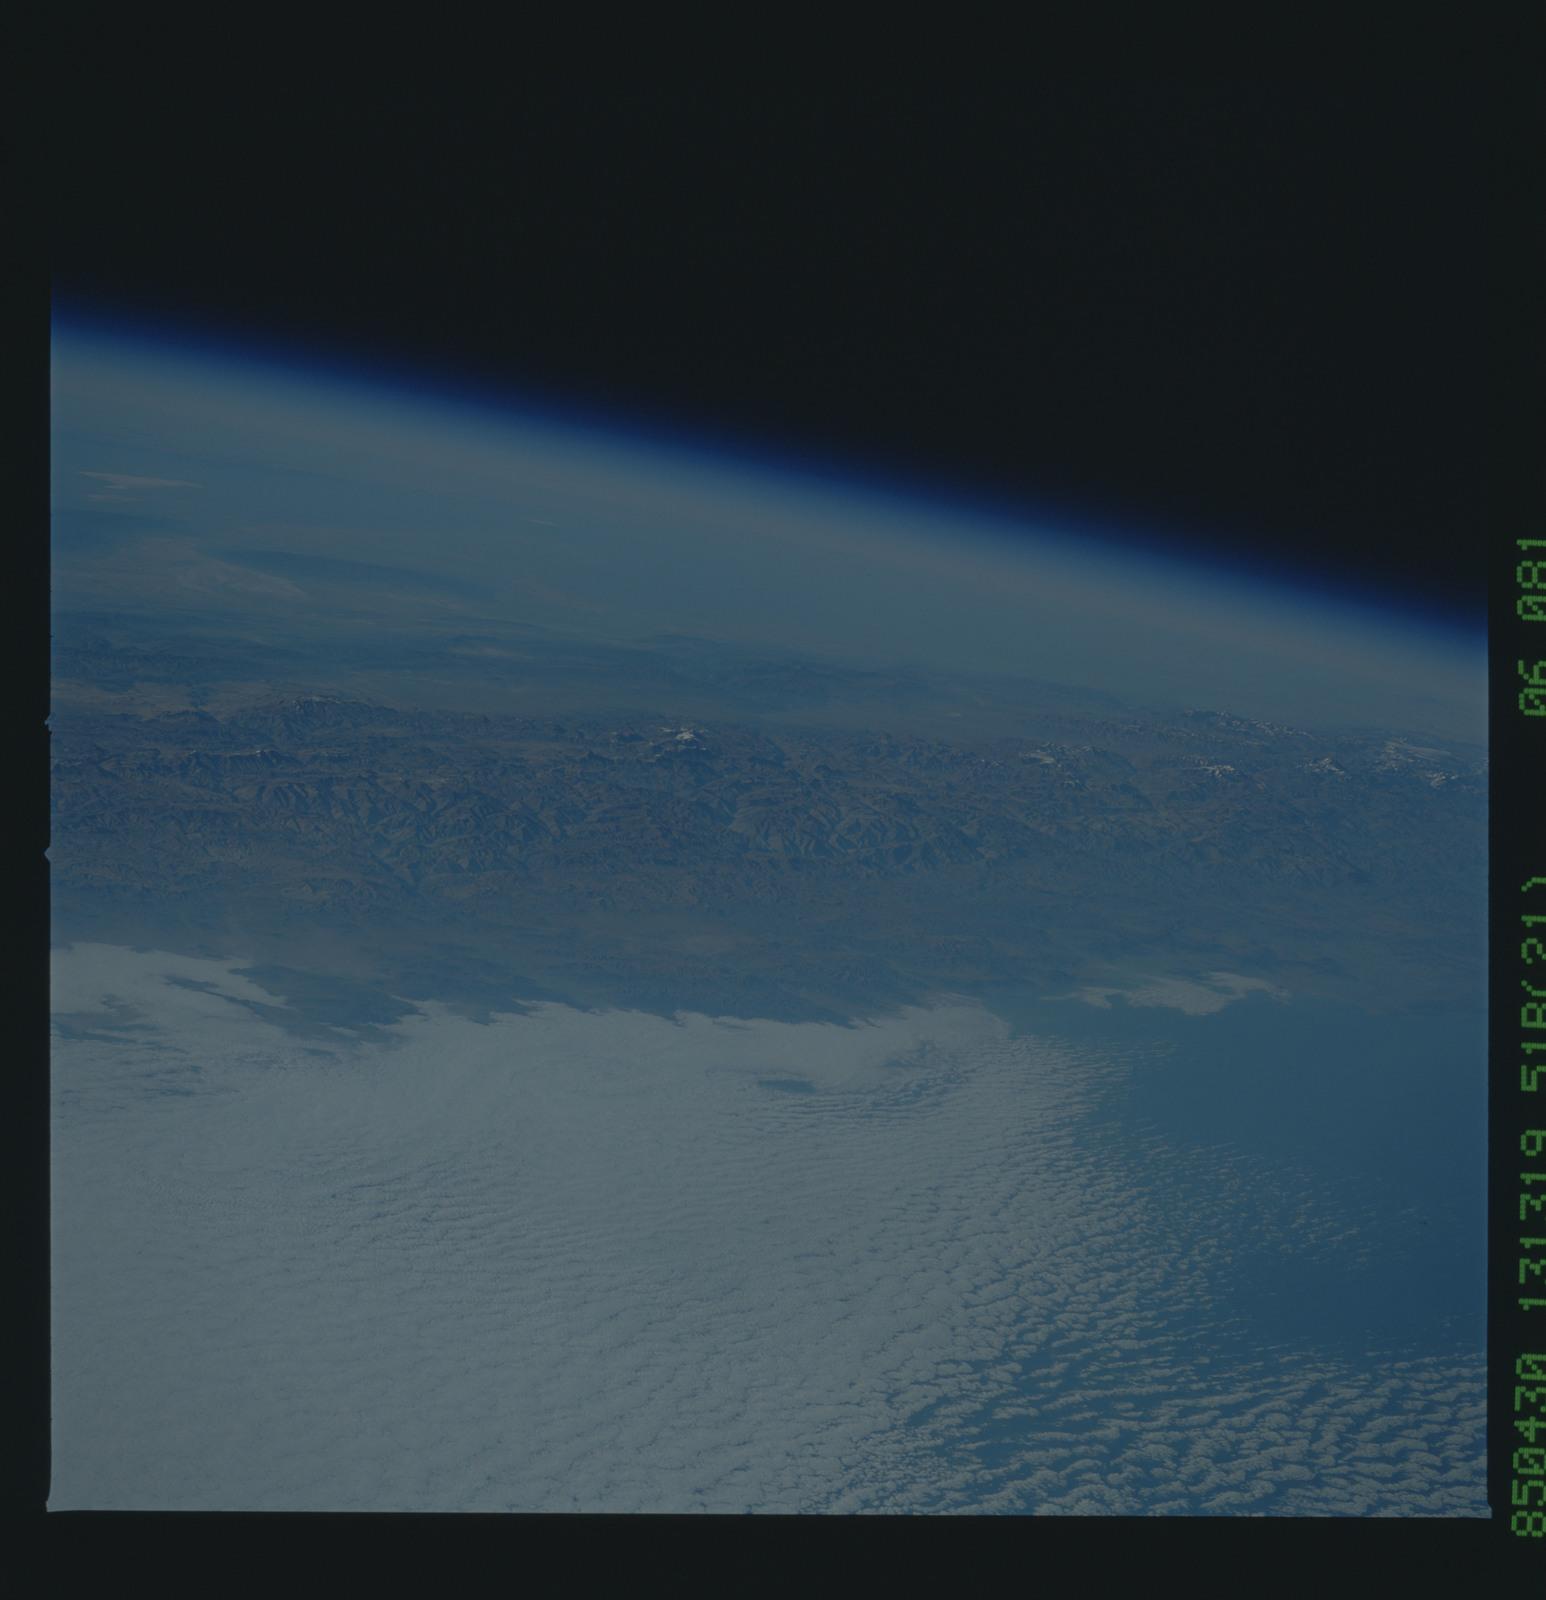 51B-36-081 - STS-51B - 51B earth observation